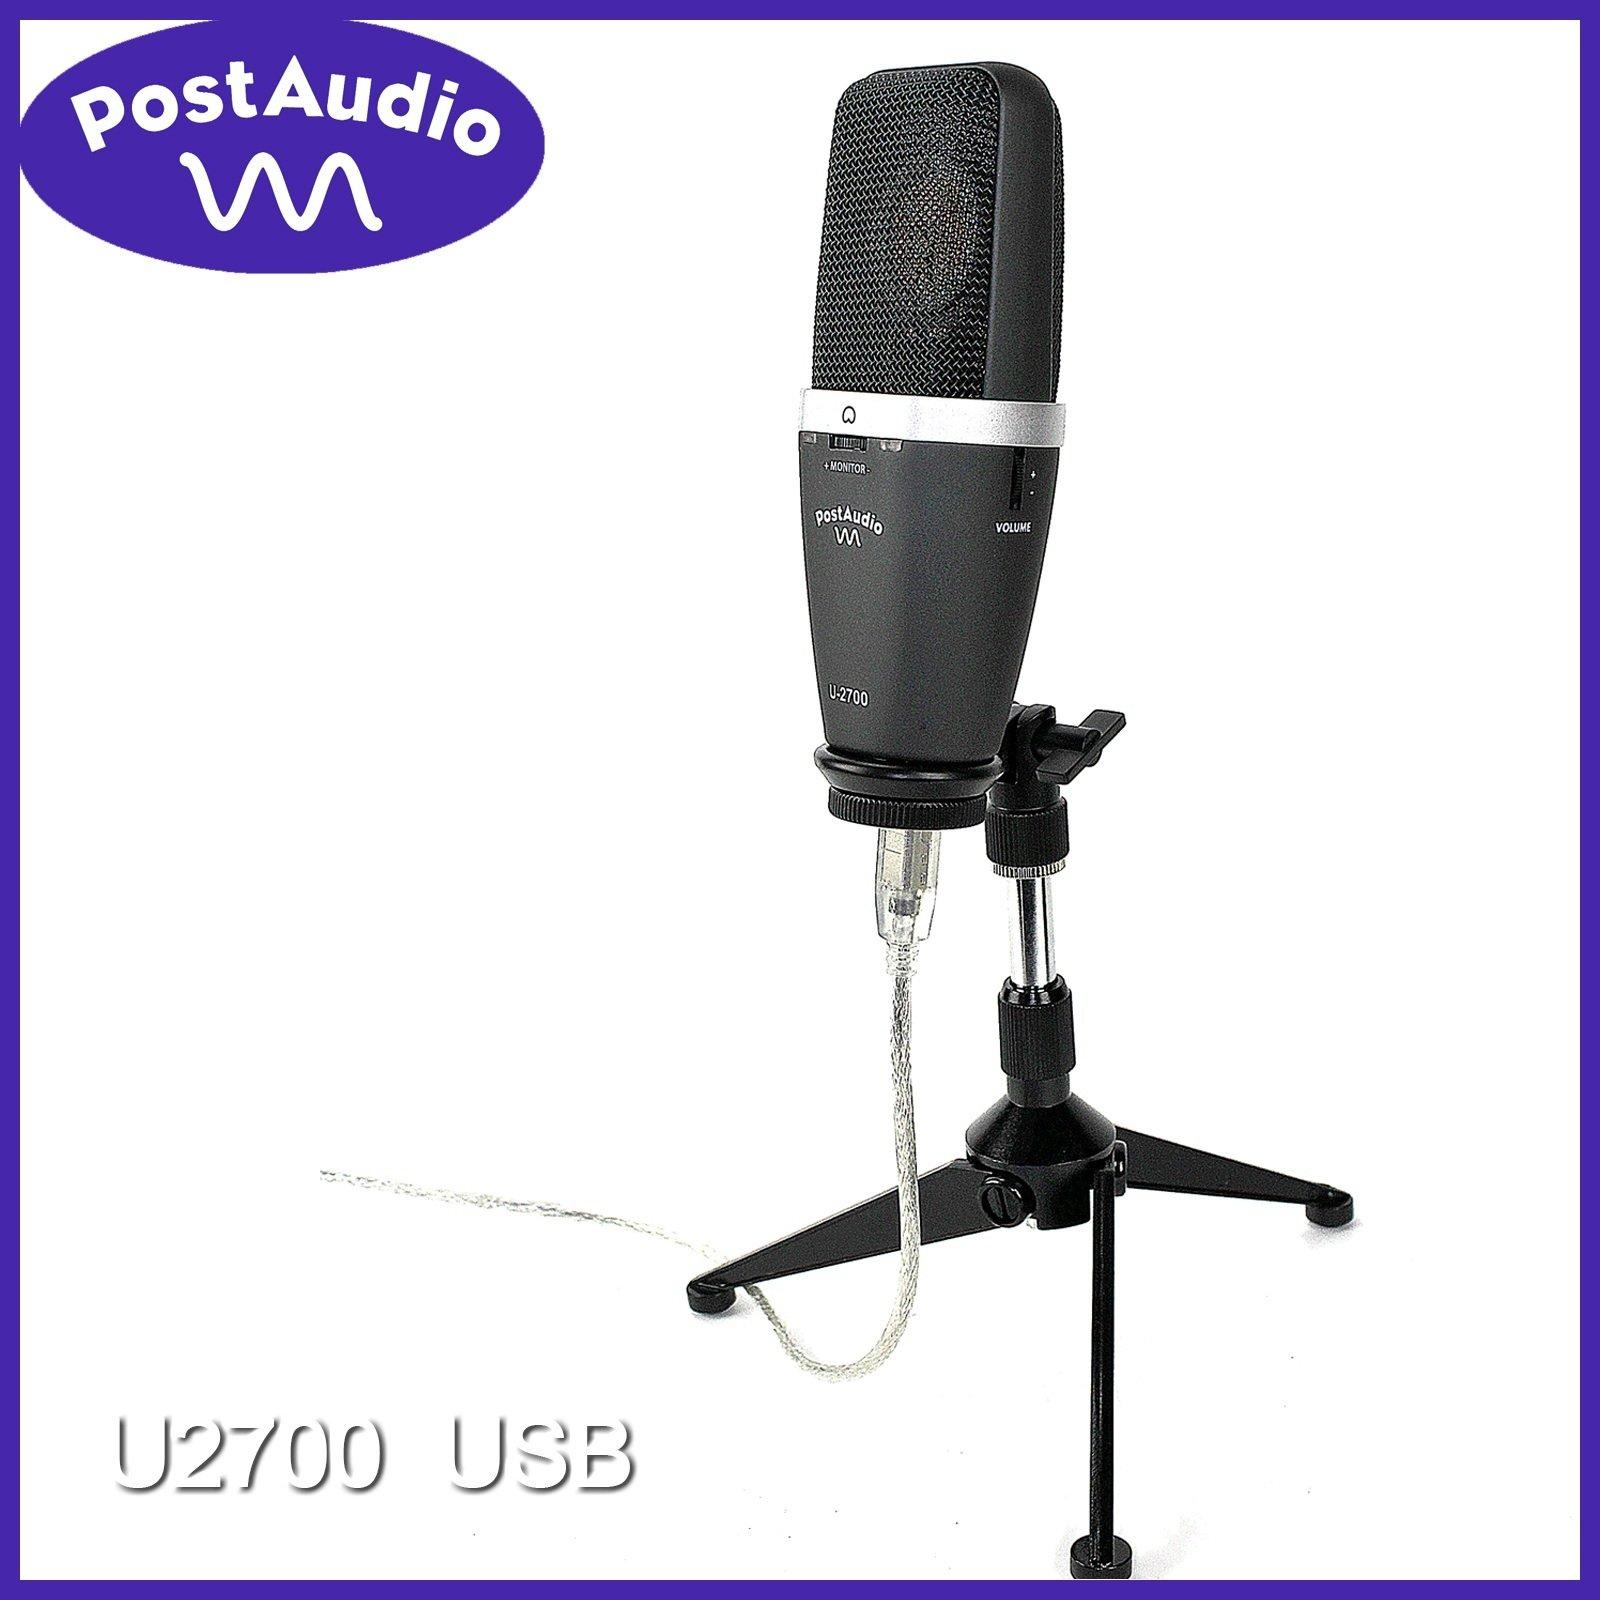 Post Audio U2700 Studio USB Condenser Mic with Complete Computer Interface